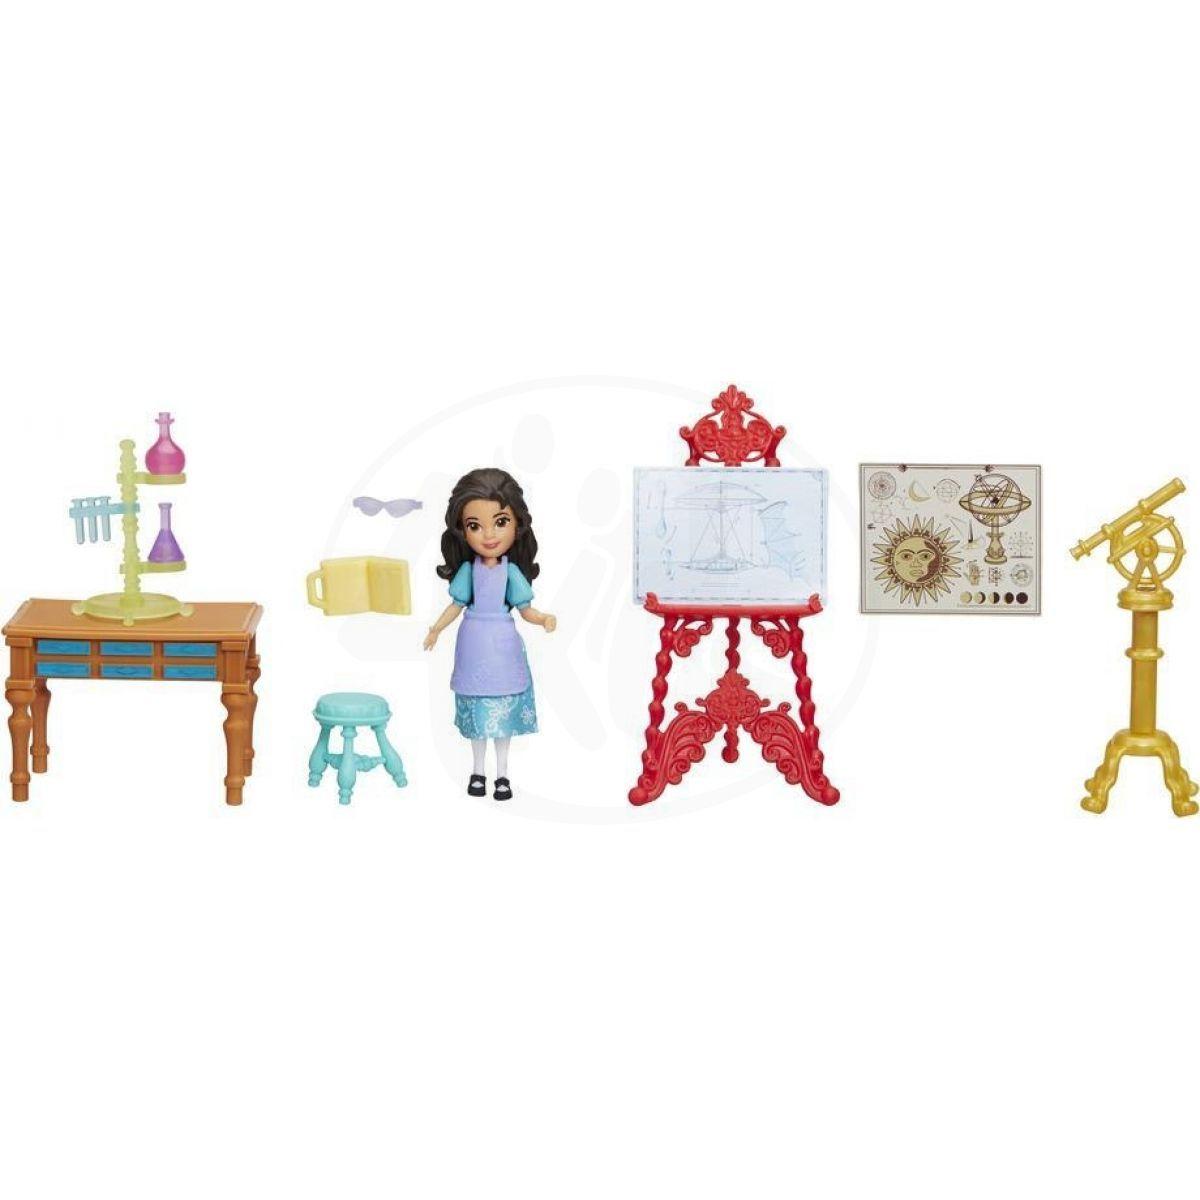 Hasbro Disney Princess Mini panenka Elena z Avaloru set Laboratoř